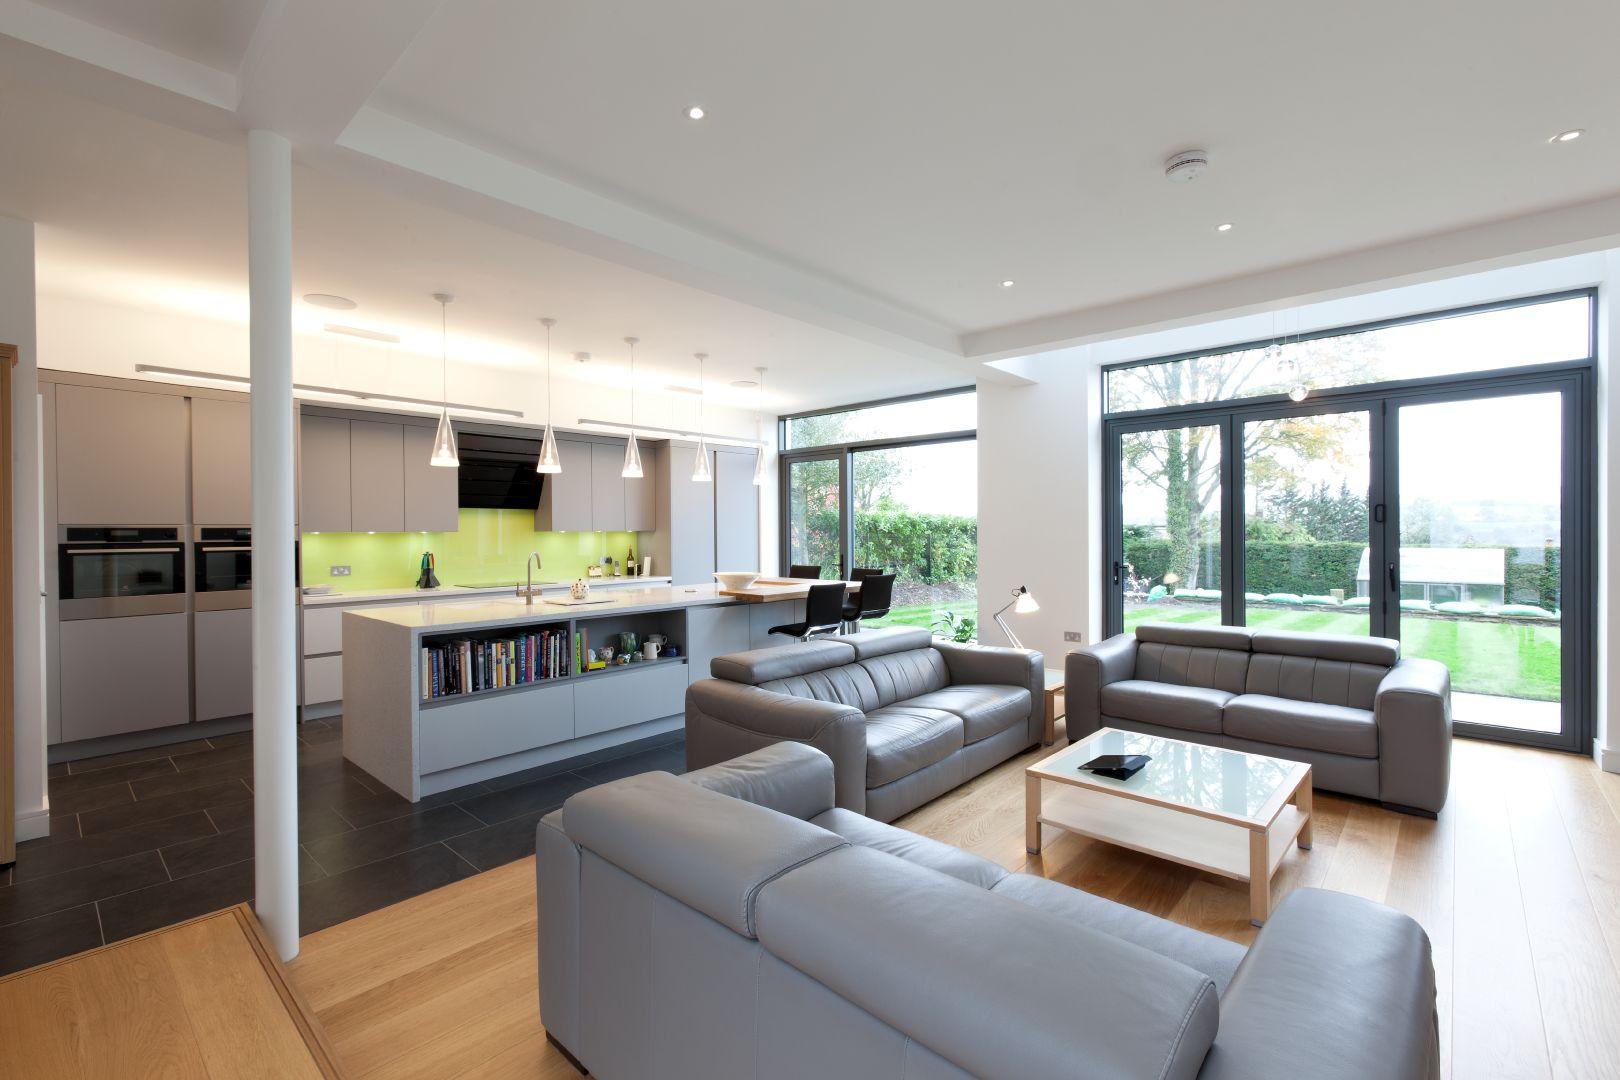 35 Ben Rhydding Road Halliday Clark Bradford Architects